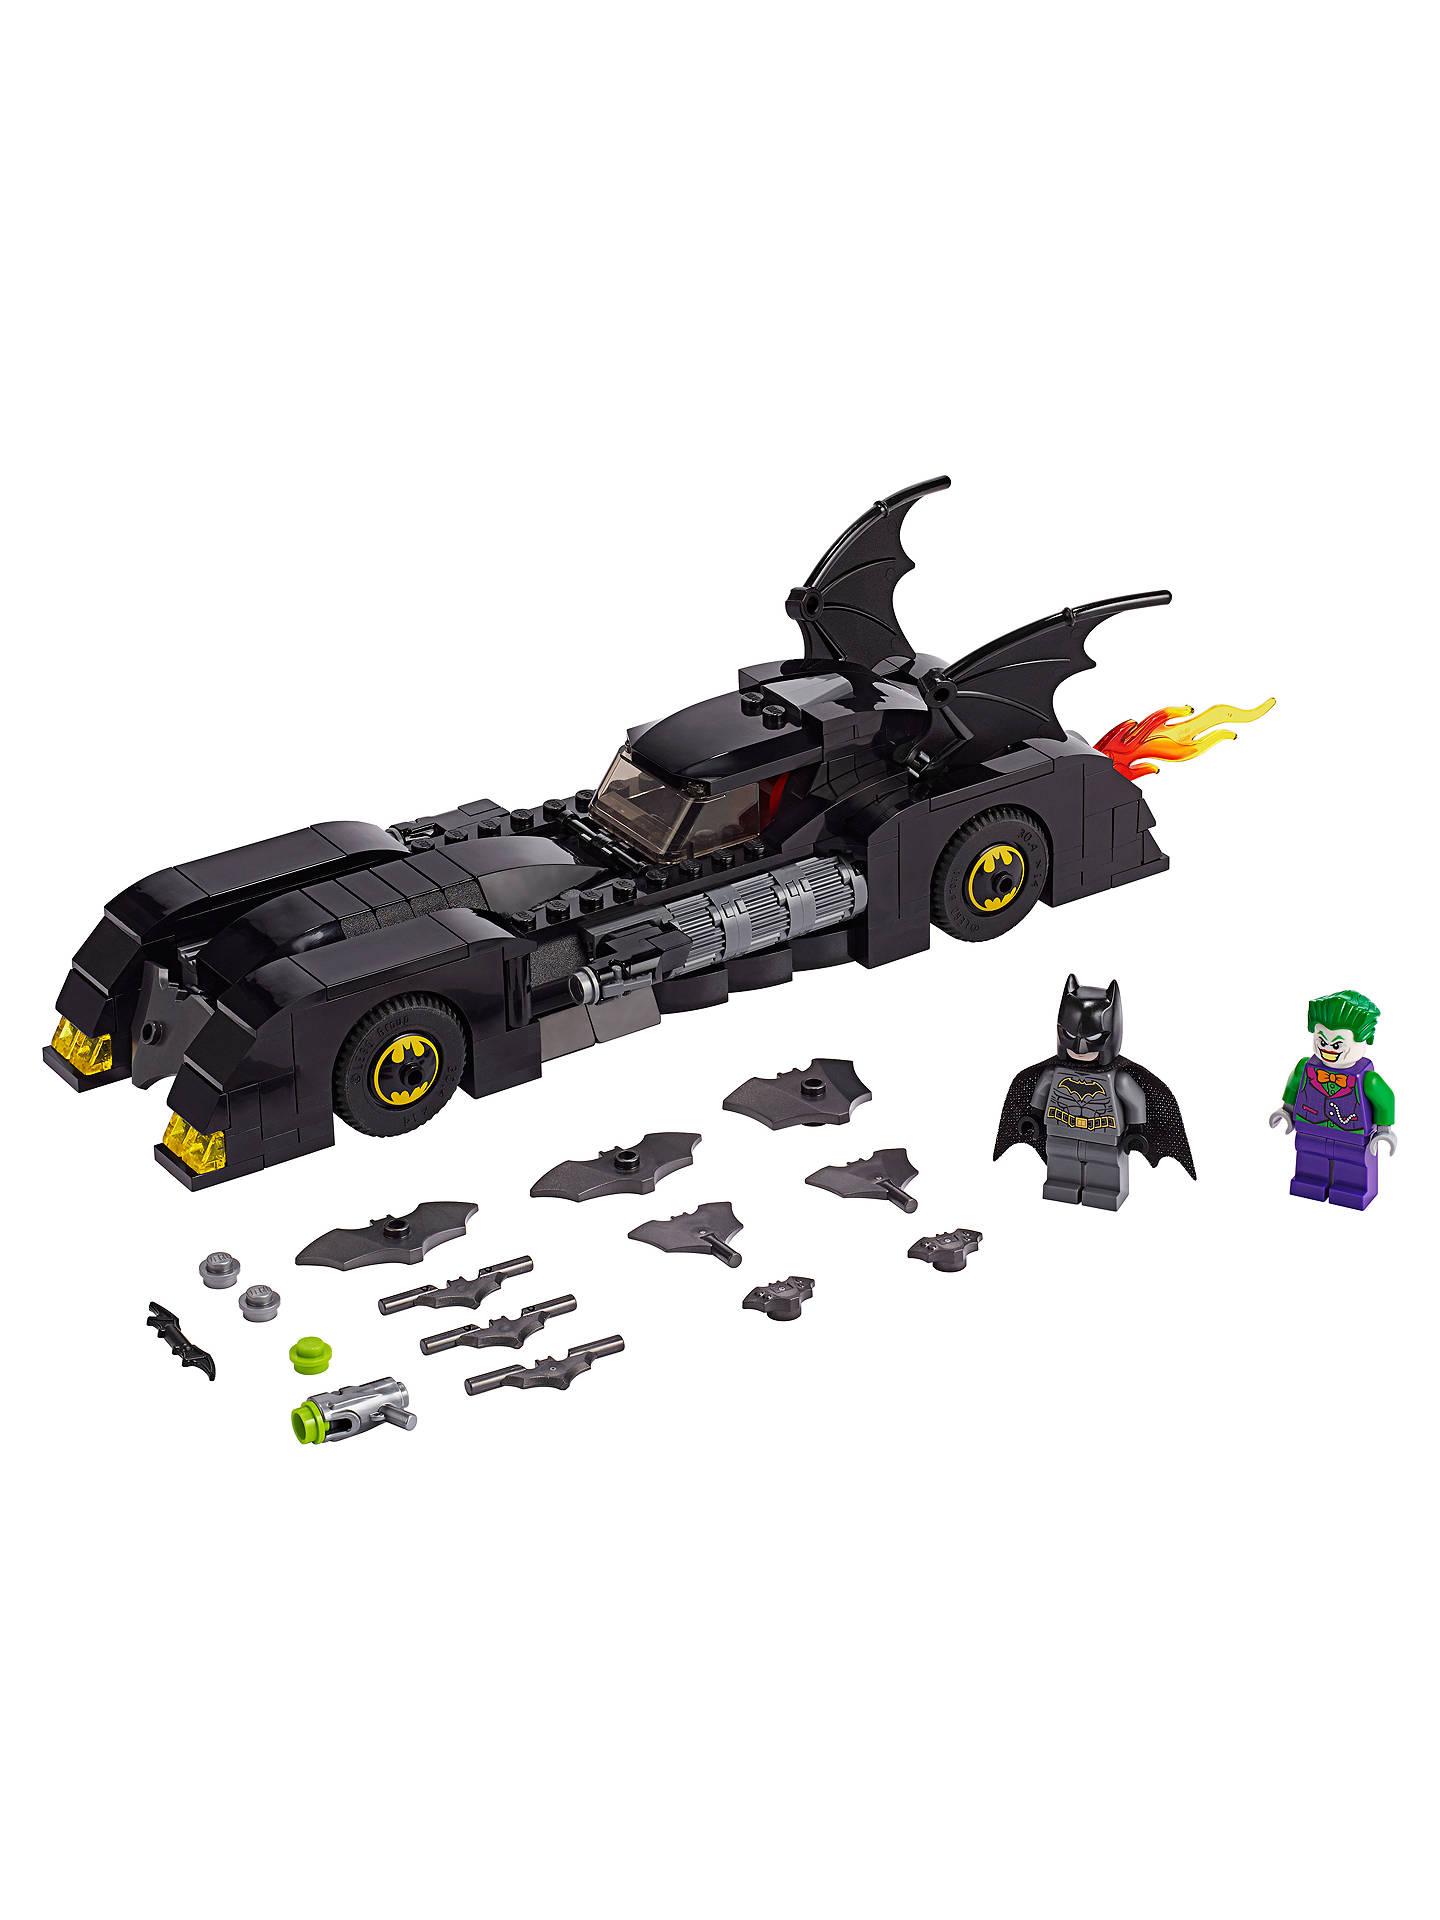 Fine Lego Dc Batman 76119 Batmobile Pursuit Of The Joker Evergreenethics Interior Chair Design Evergreenethicsorg